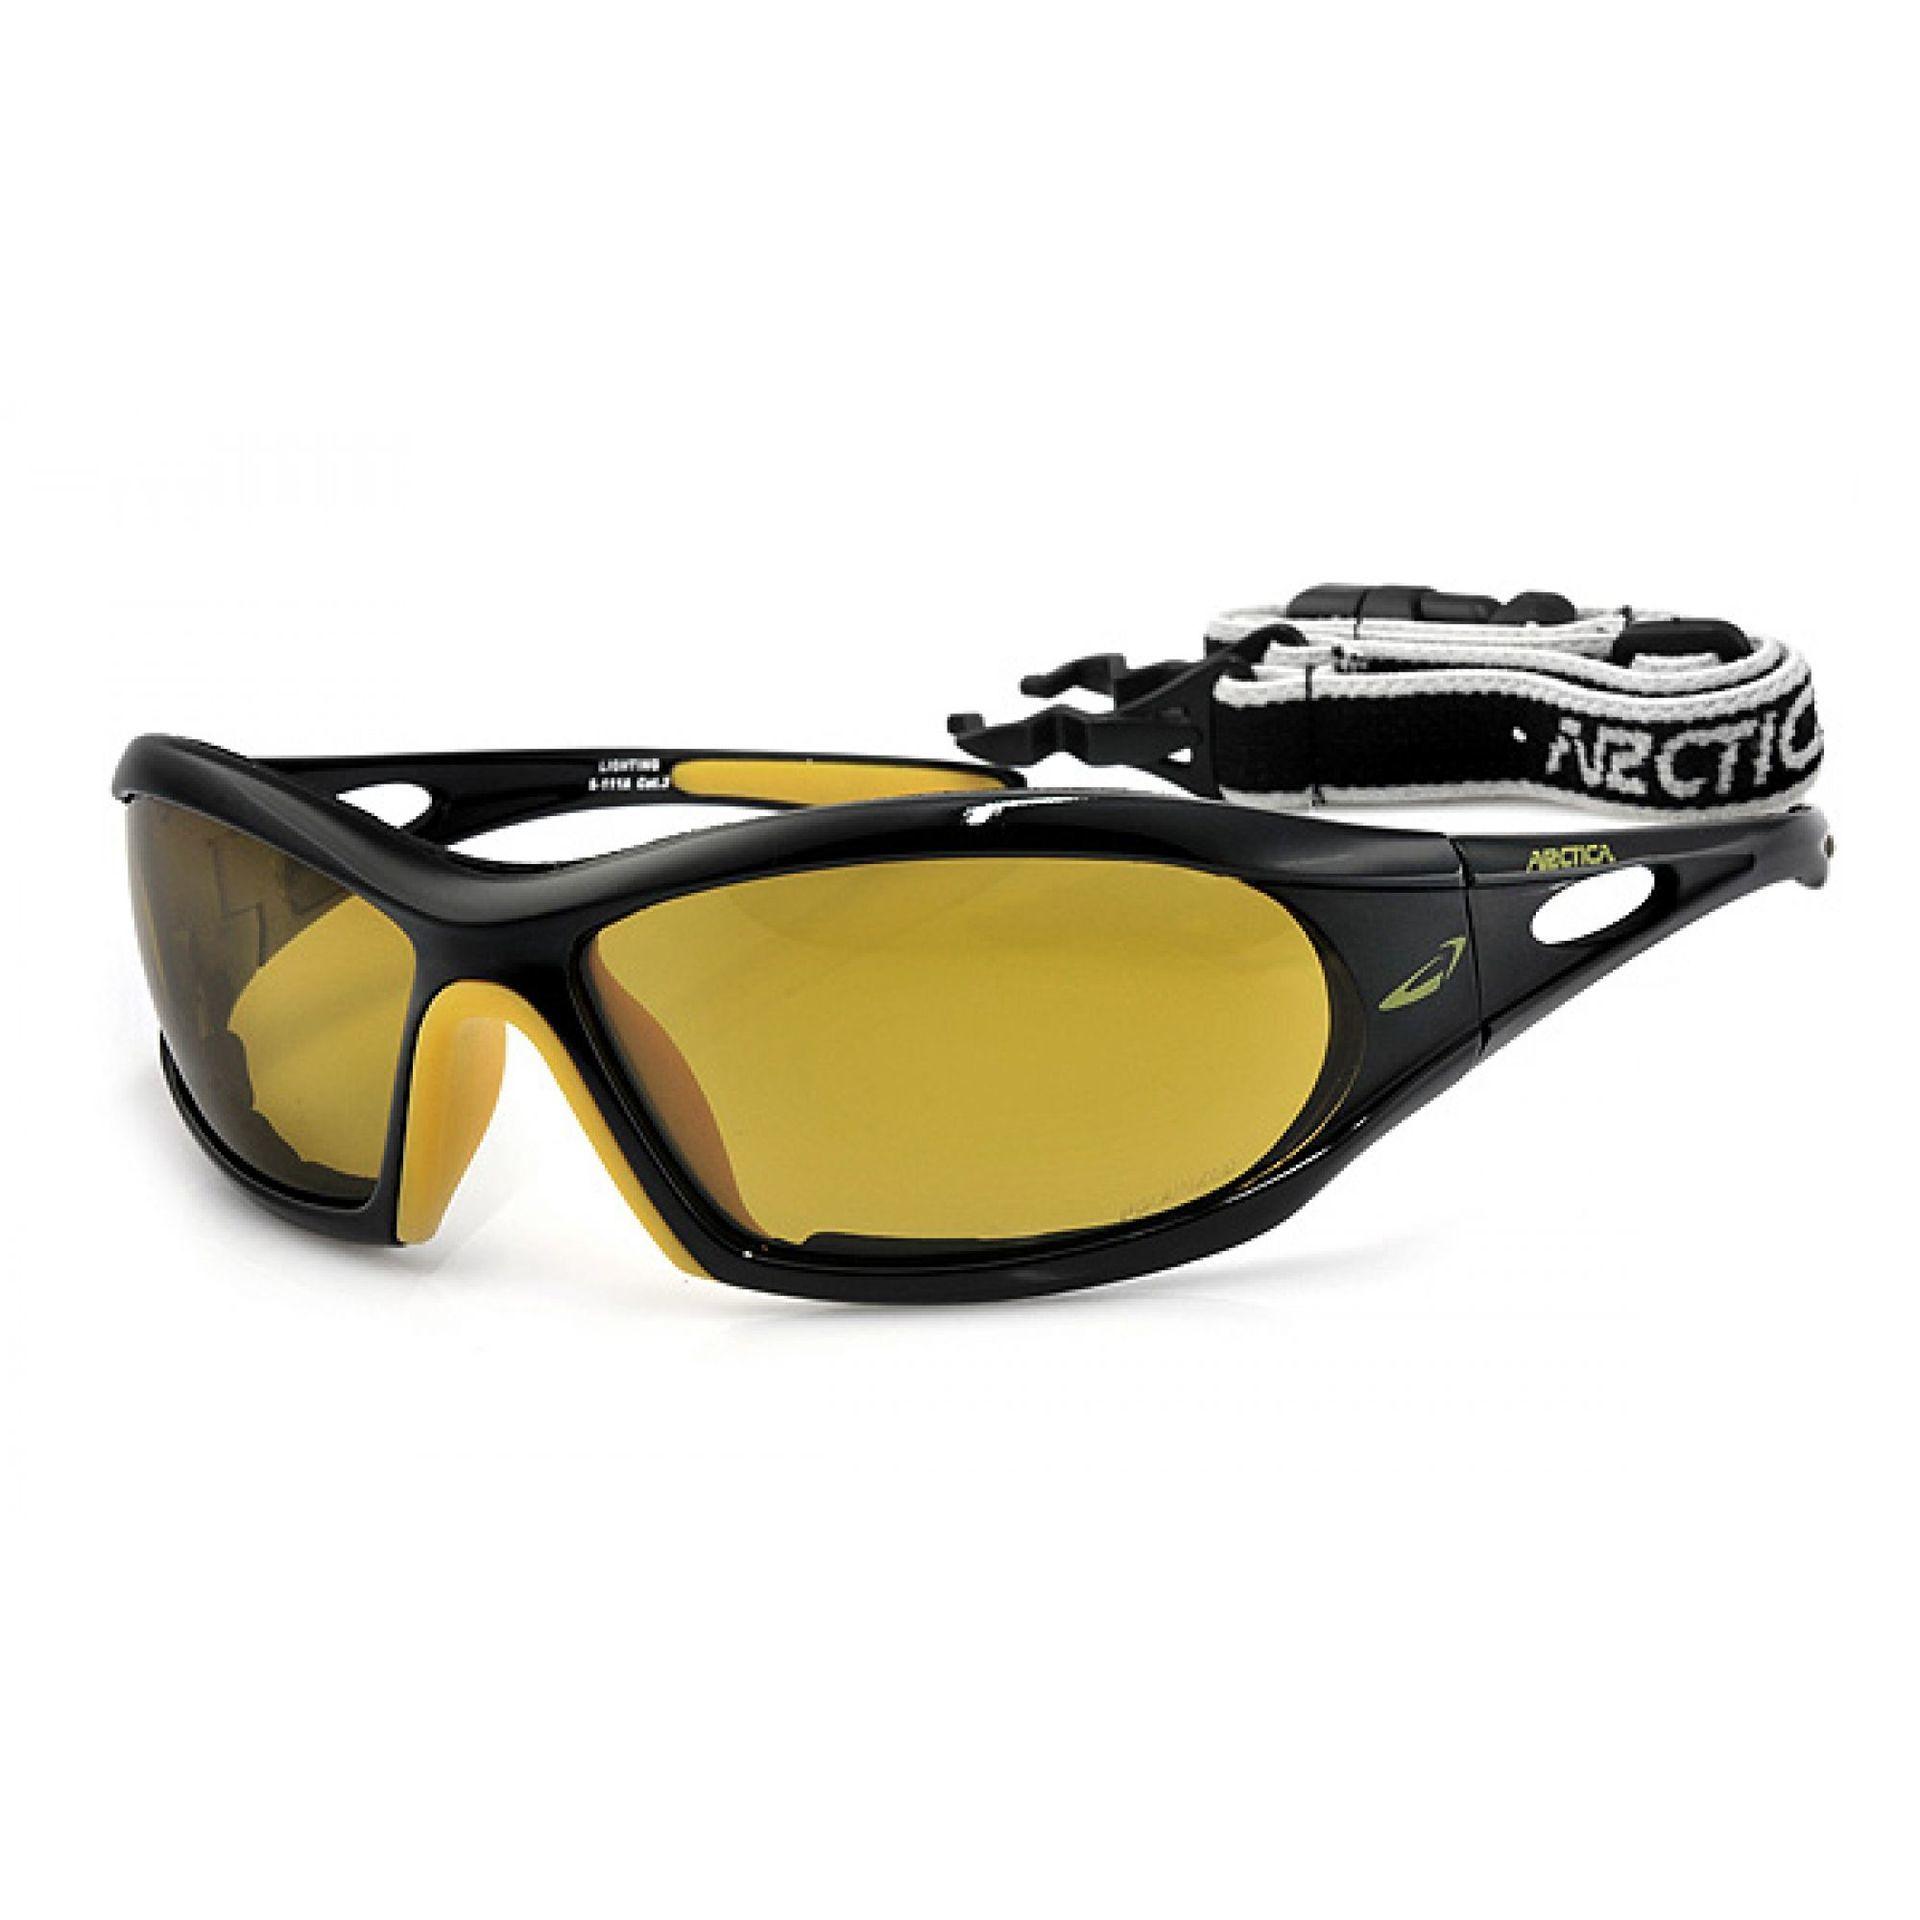 Okulary Arctica S-111A czarno żółte